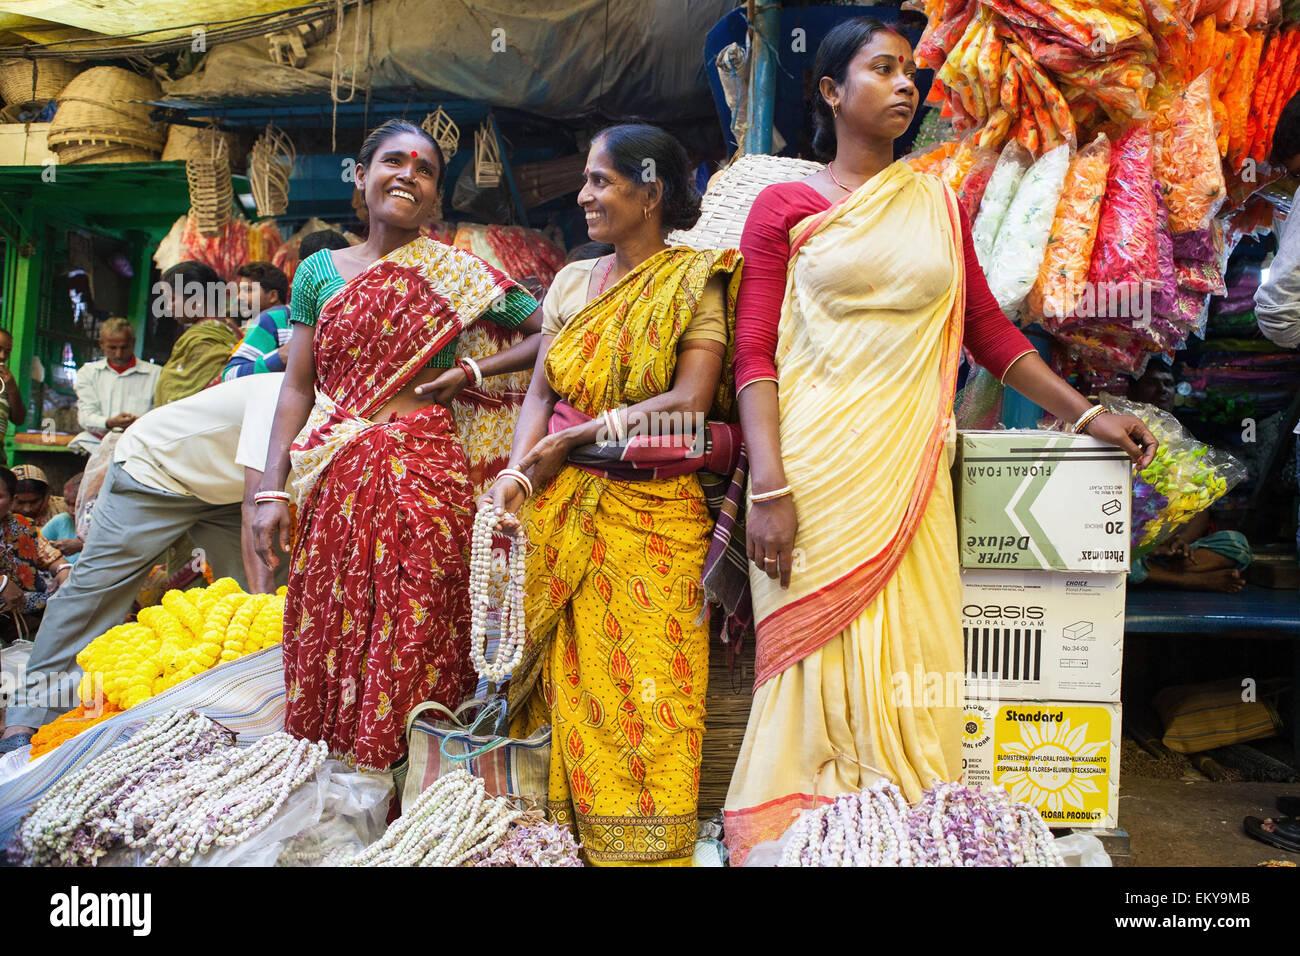 Women selling garlands at the Malik Ghat Flower Market in Calcutta (Kolkata) - Stock Image